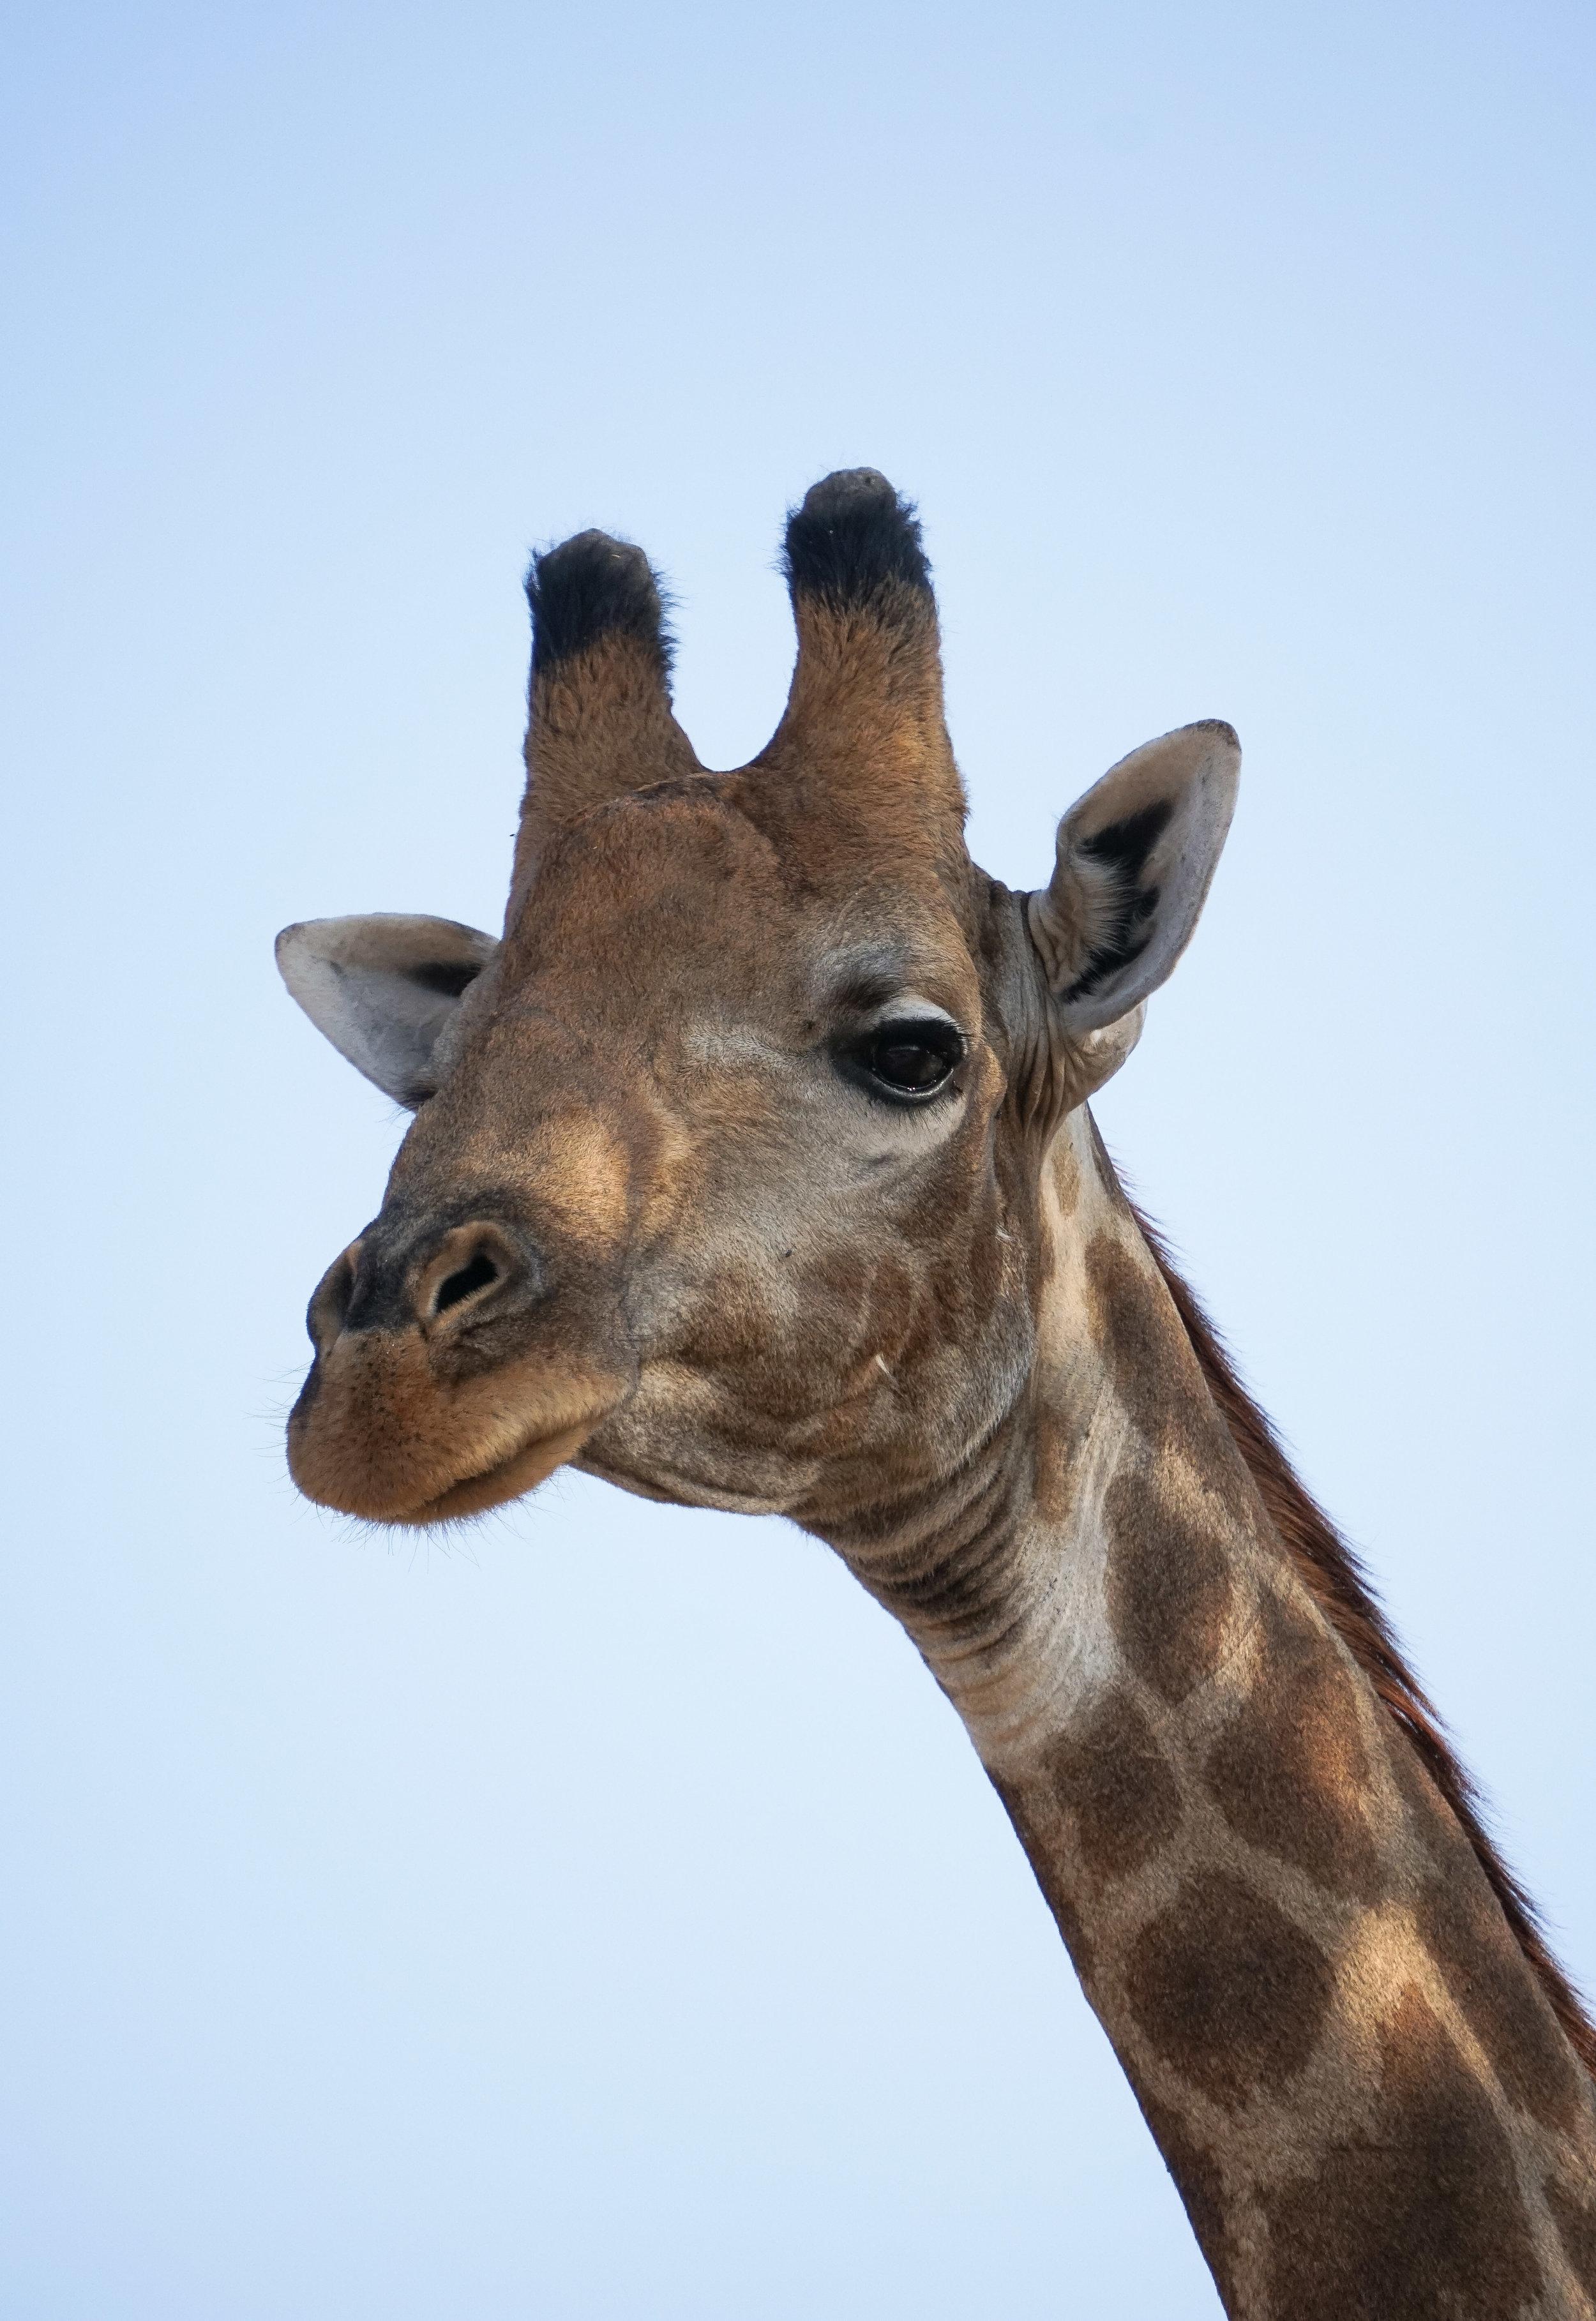 curio.trips.botswana.okavango.delta.giraffe.stare.close.up.portrait-2.jpg